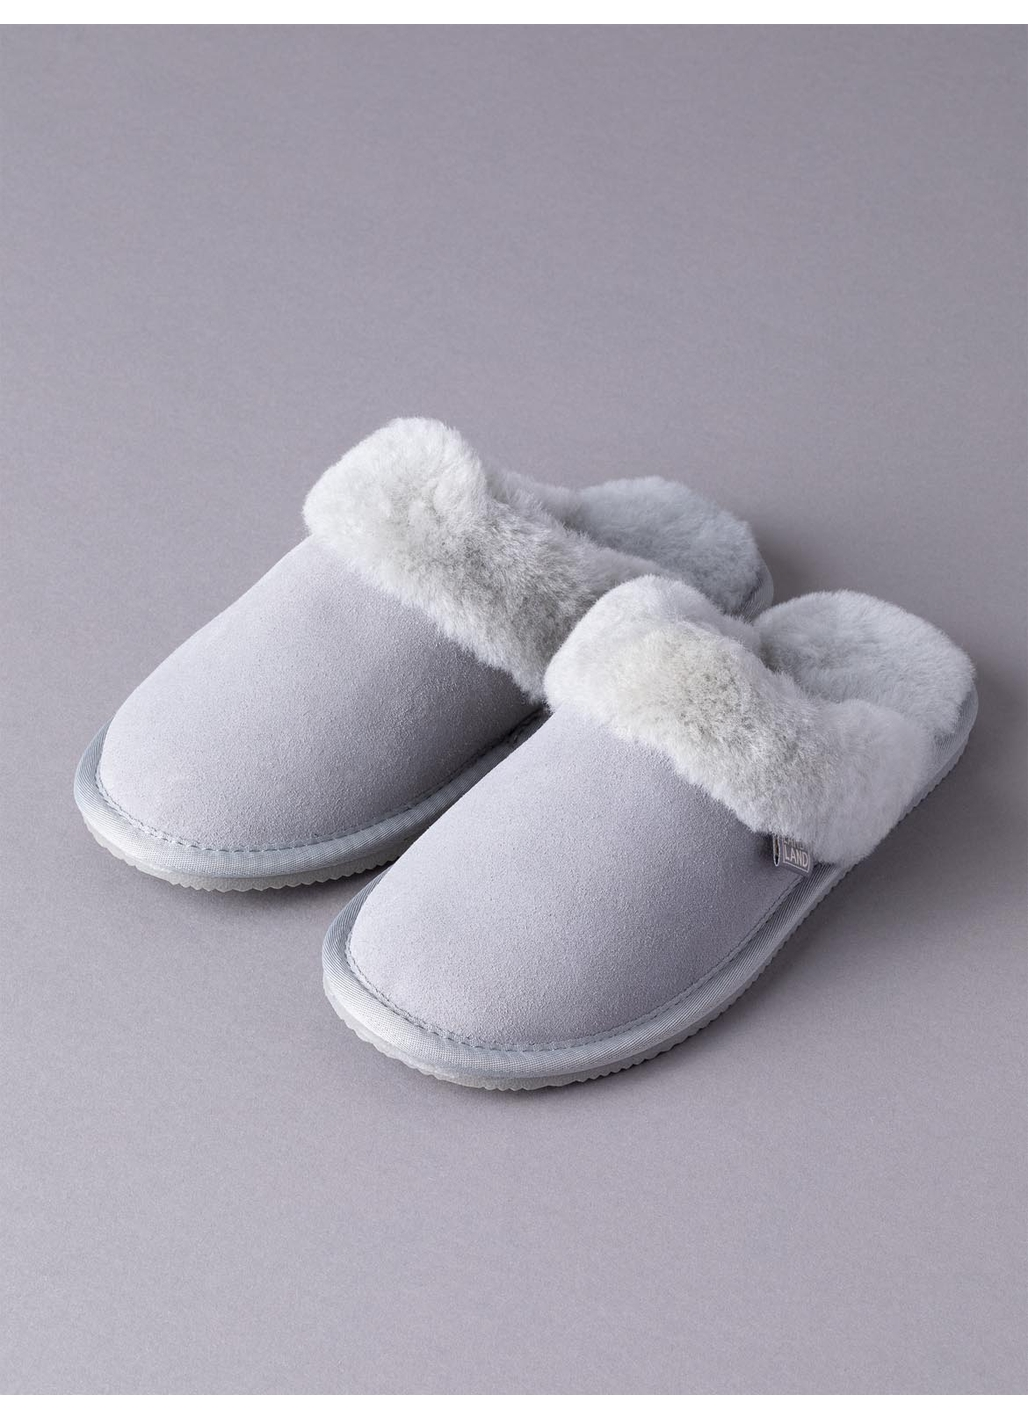 Ladies' Sheepskin Slider Slippers in Light Grey